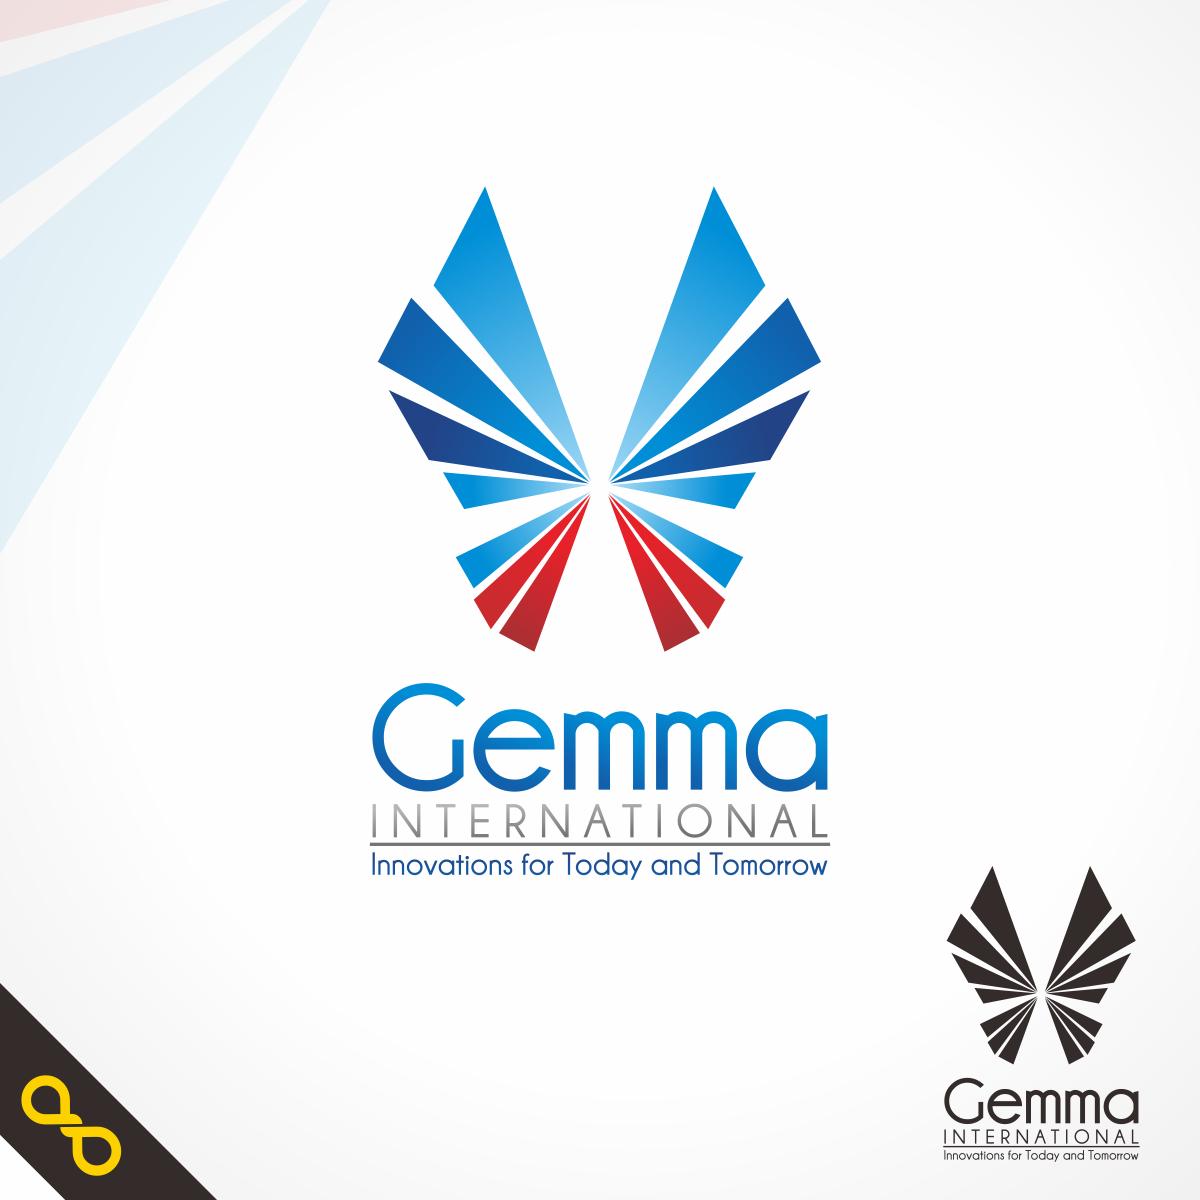 Logo Design by PJD - Entry No. 15 in the Logo Design Contest Artistic Logo Design for Gemma International.